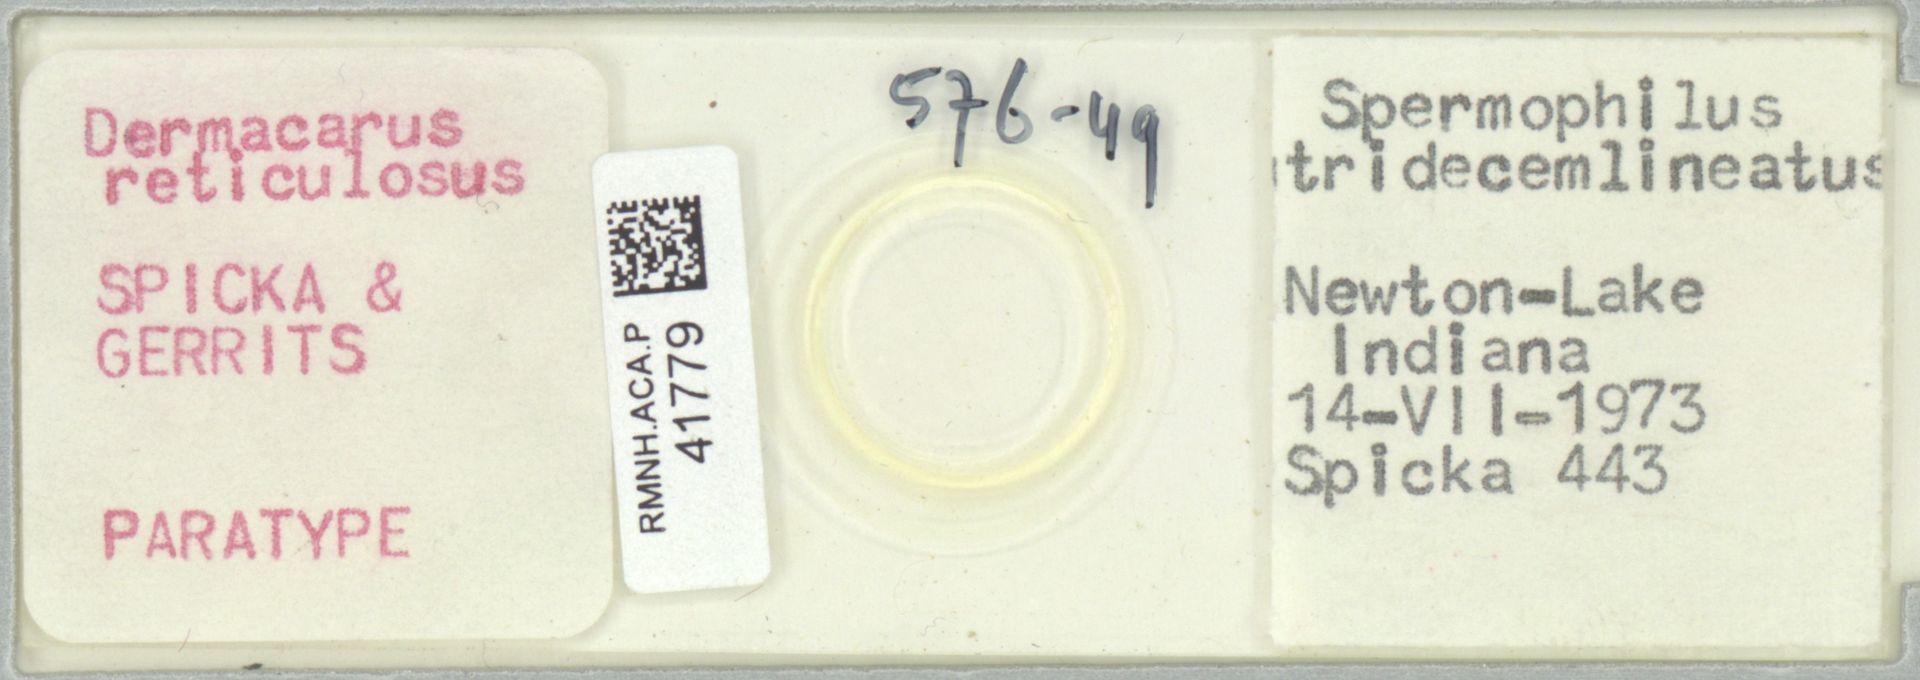 RMNH.ACA.P.41779 | Dermacarus reticulosus Spicka & Gerrits